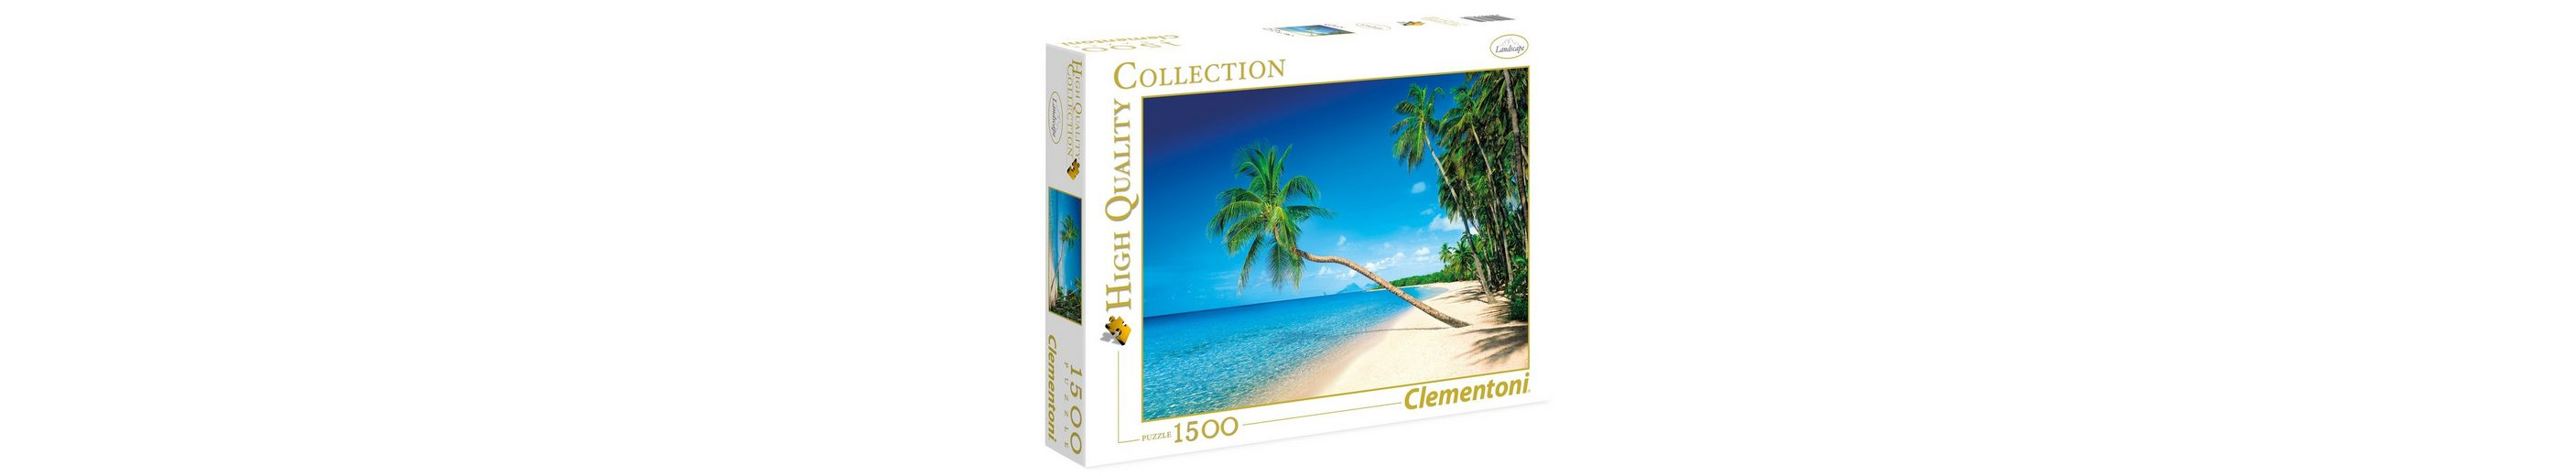 Clementoni Puzzle, 1500 Teile, »Martinique, Karibik«